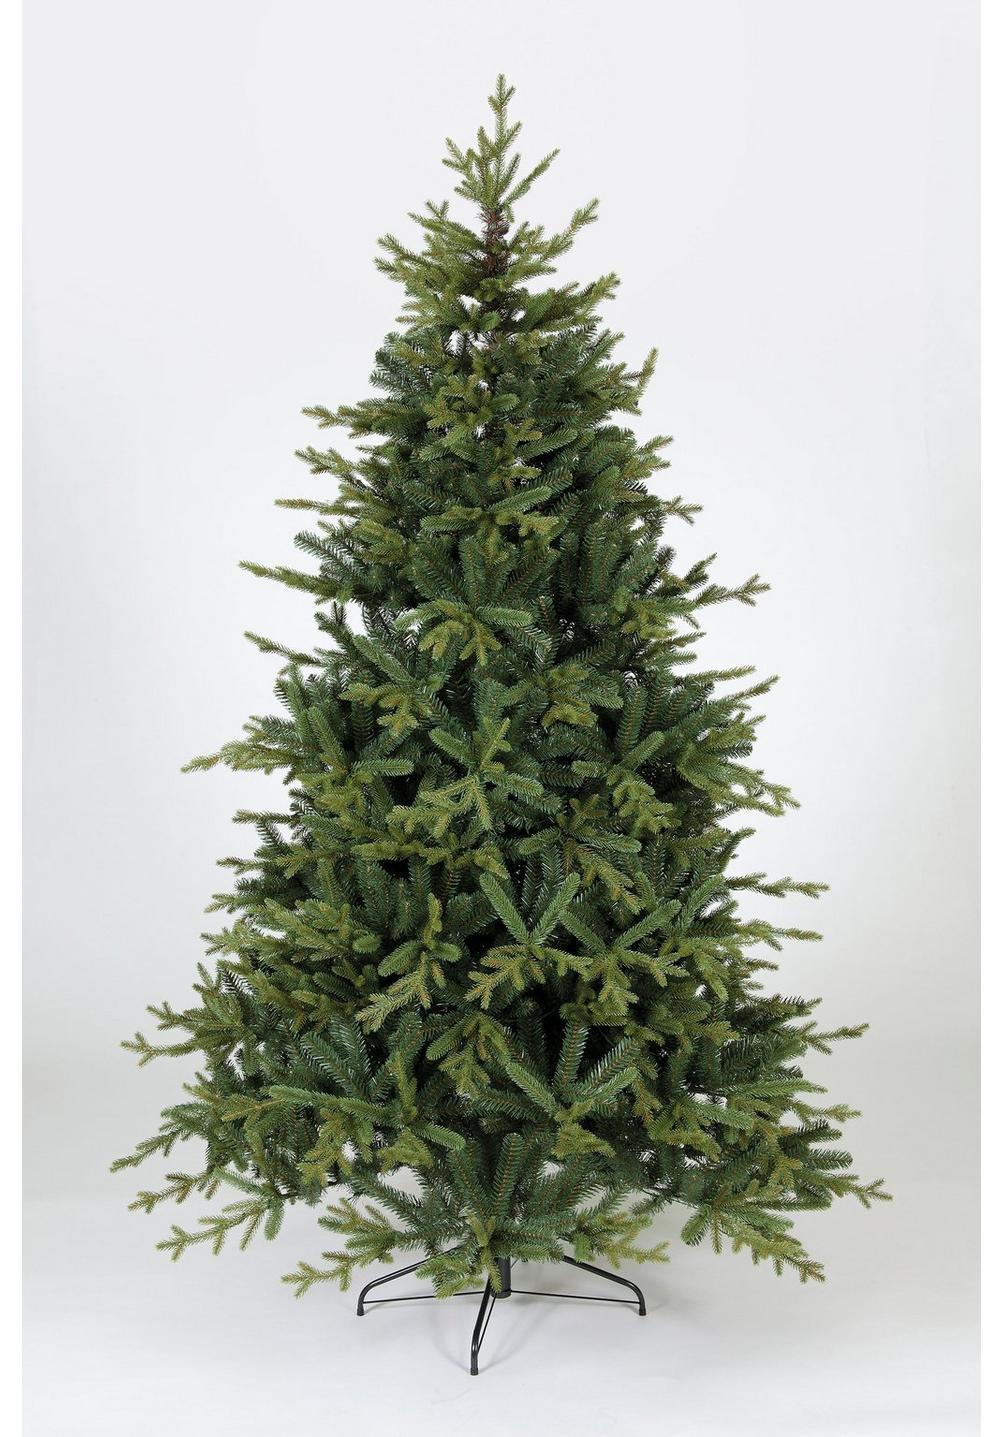 Norway Spruce Christmas Tree | Studio